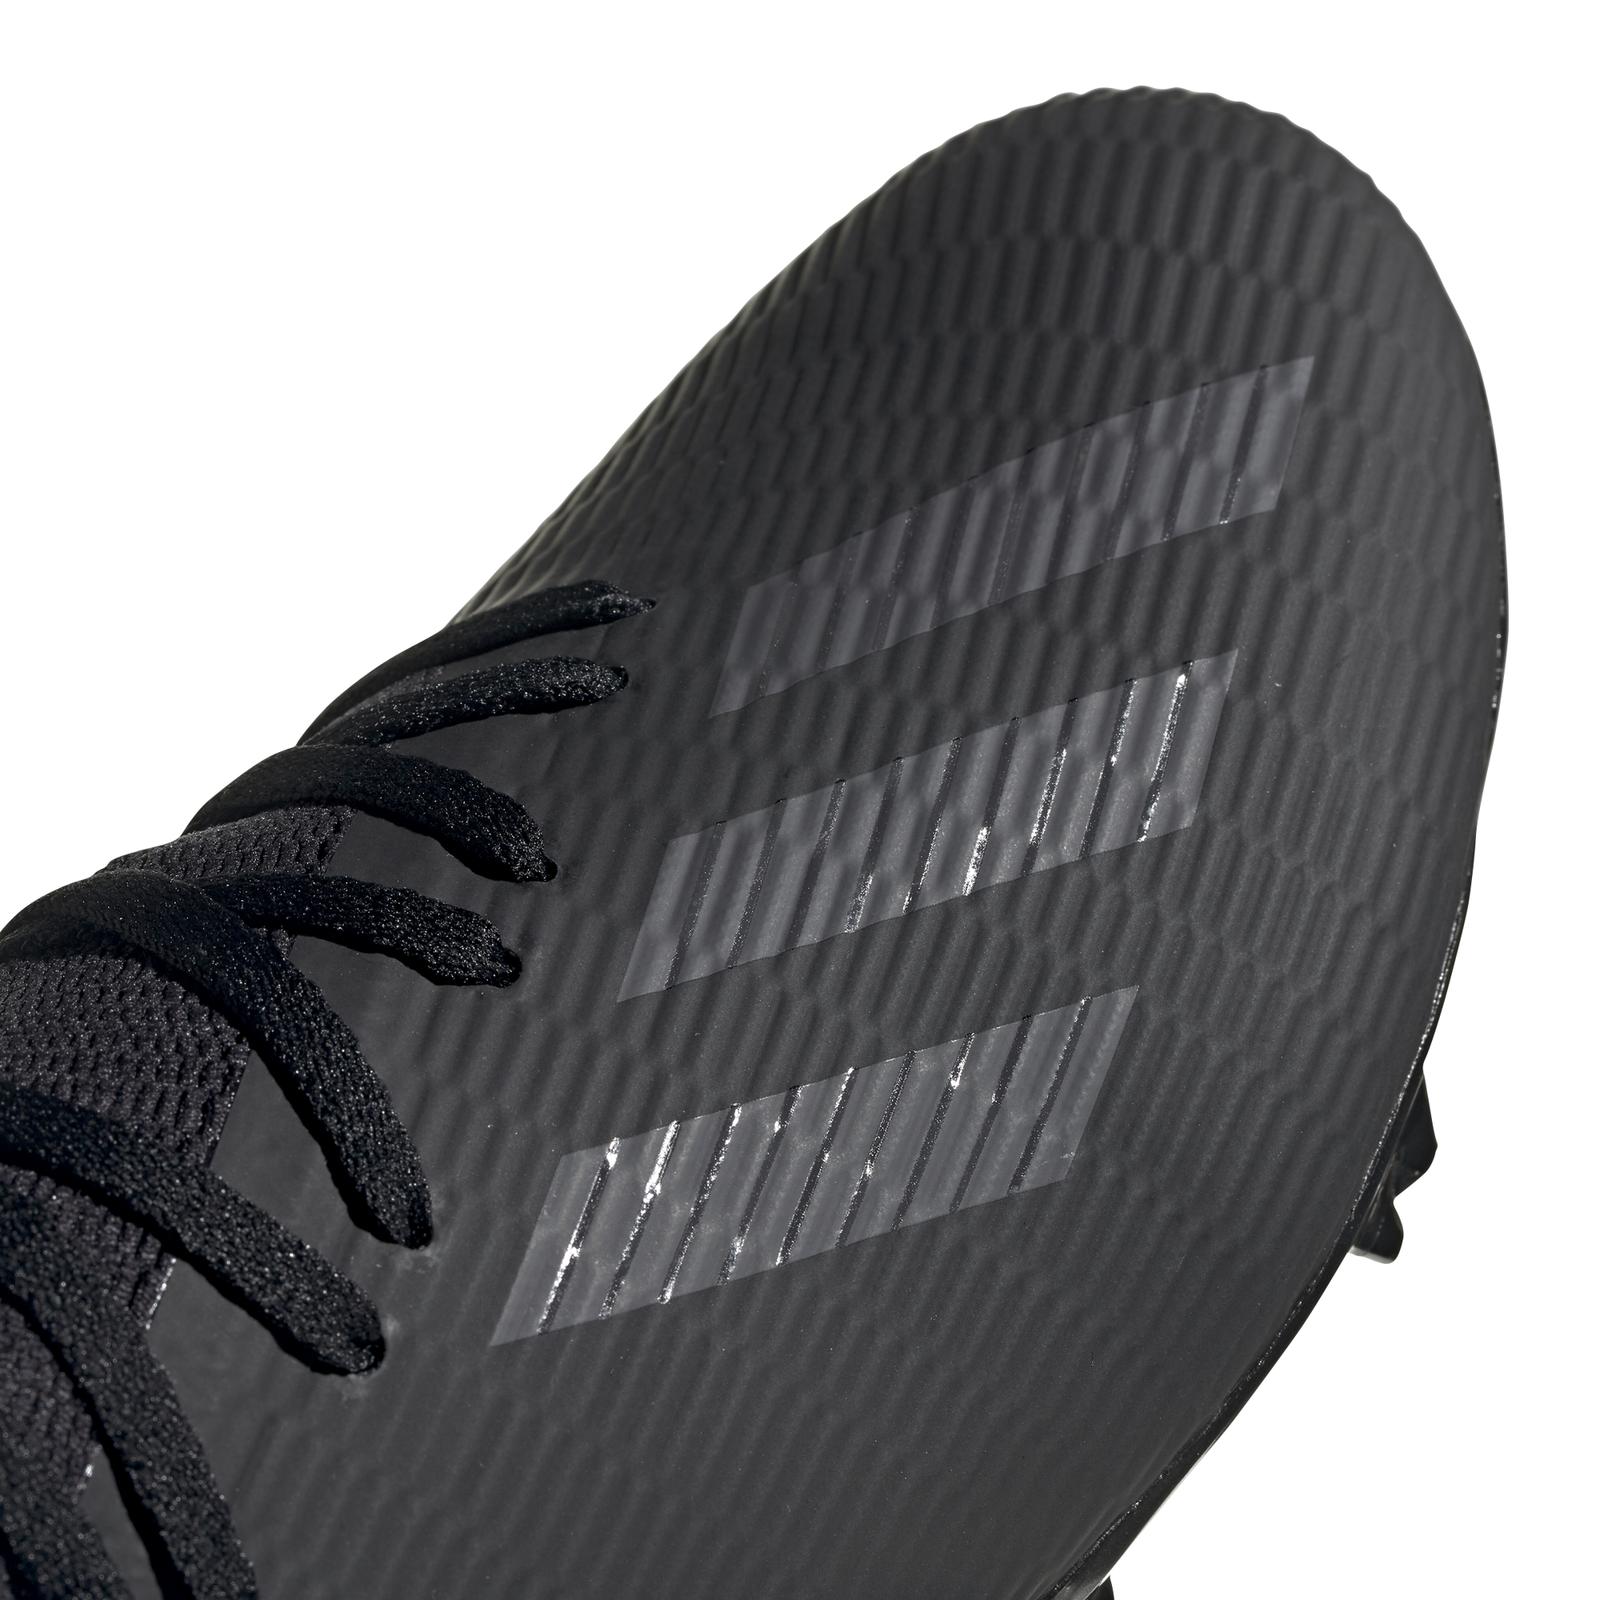 FG 19.3 X Adidas Scarpe Scarpe f35381 Sportive 13 43 NERO